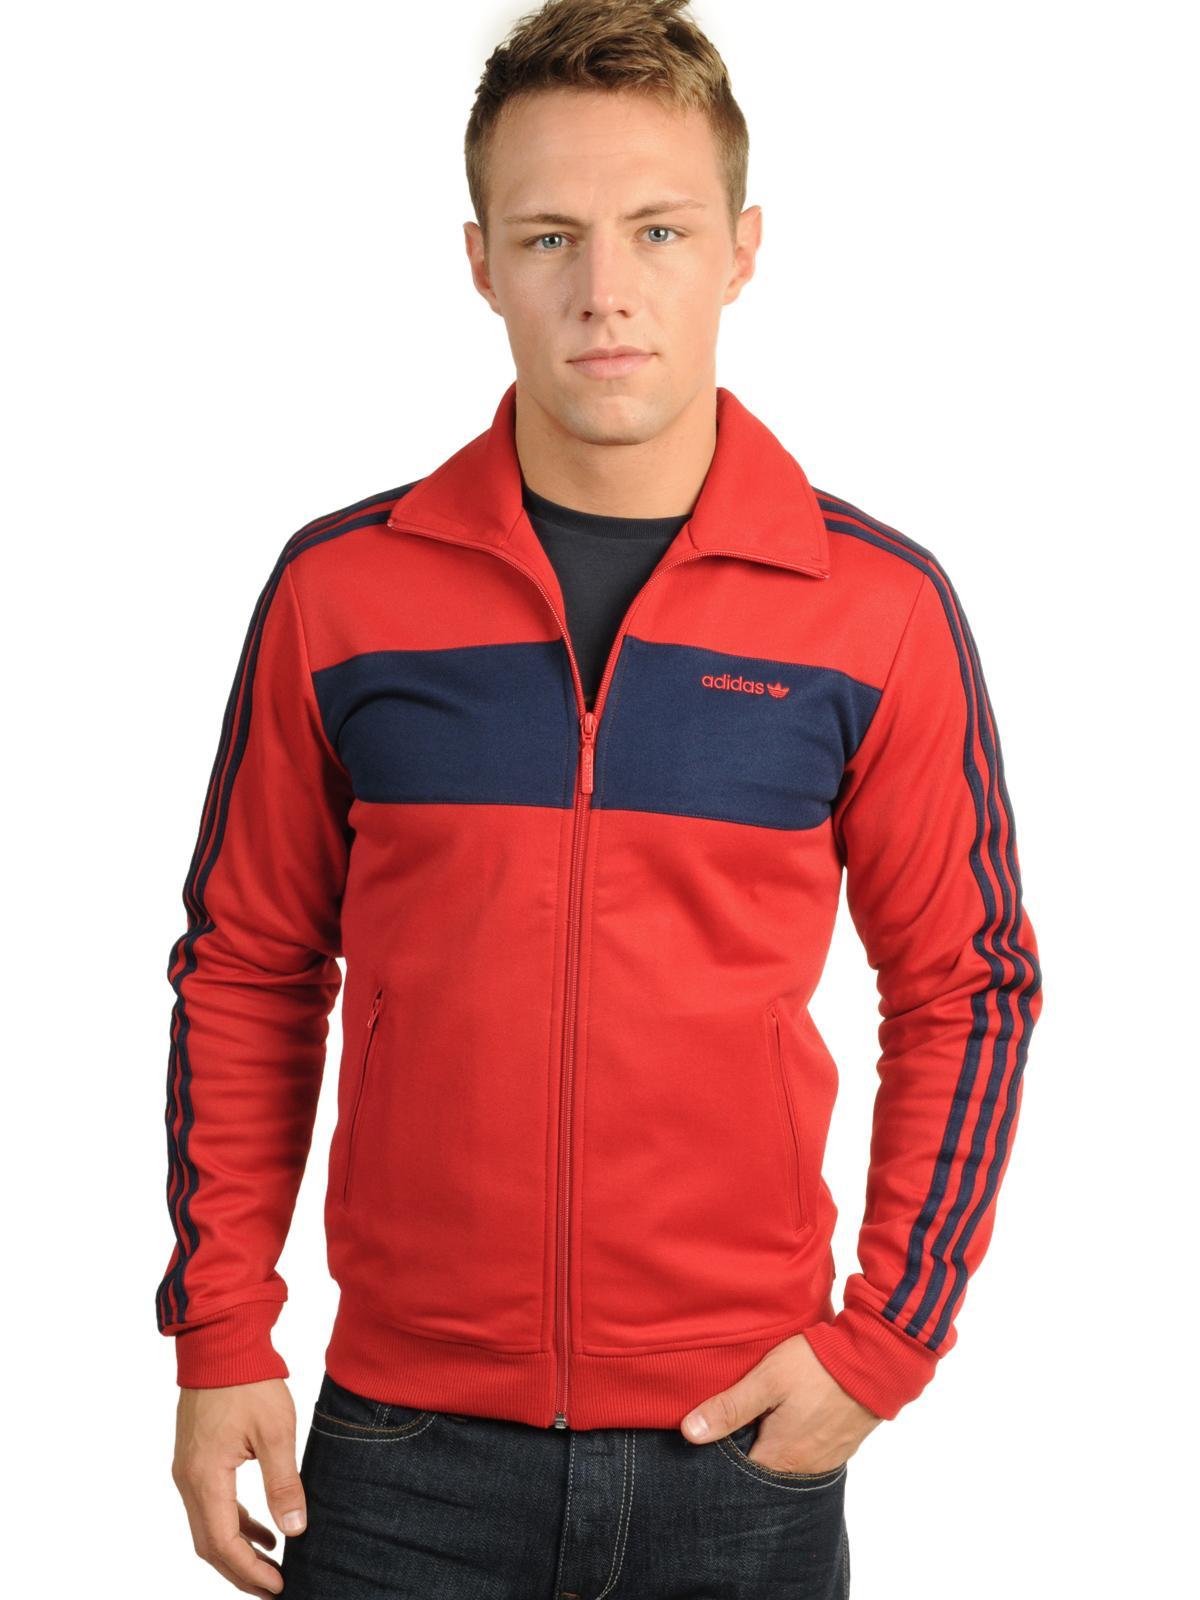 Originals Beckenbauer Adidas V7wg1q1 Chaqueta Spo Rojomarino UBn8qR6wCB